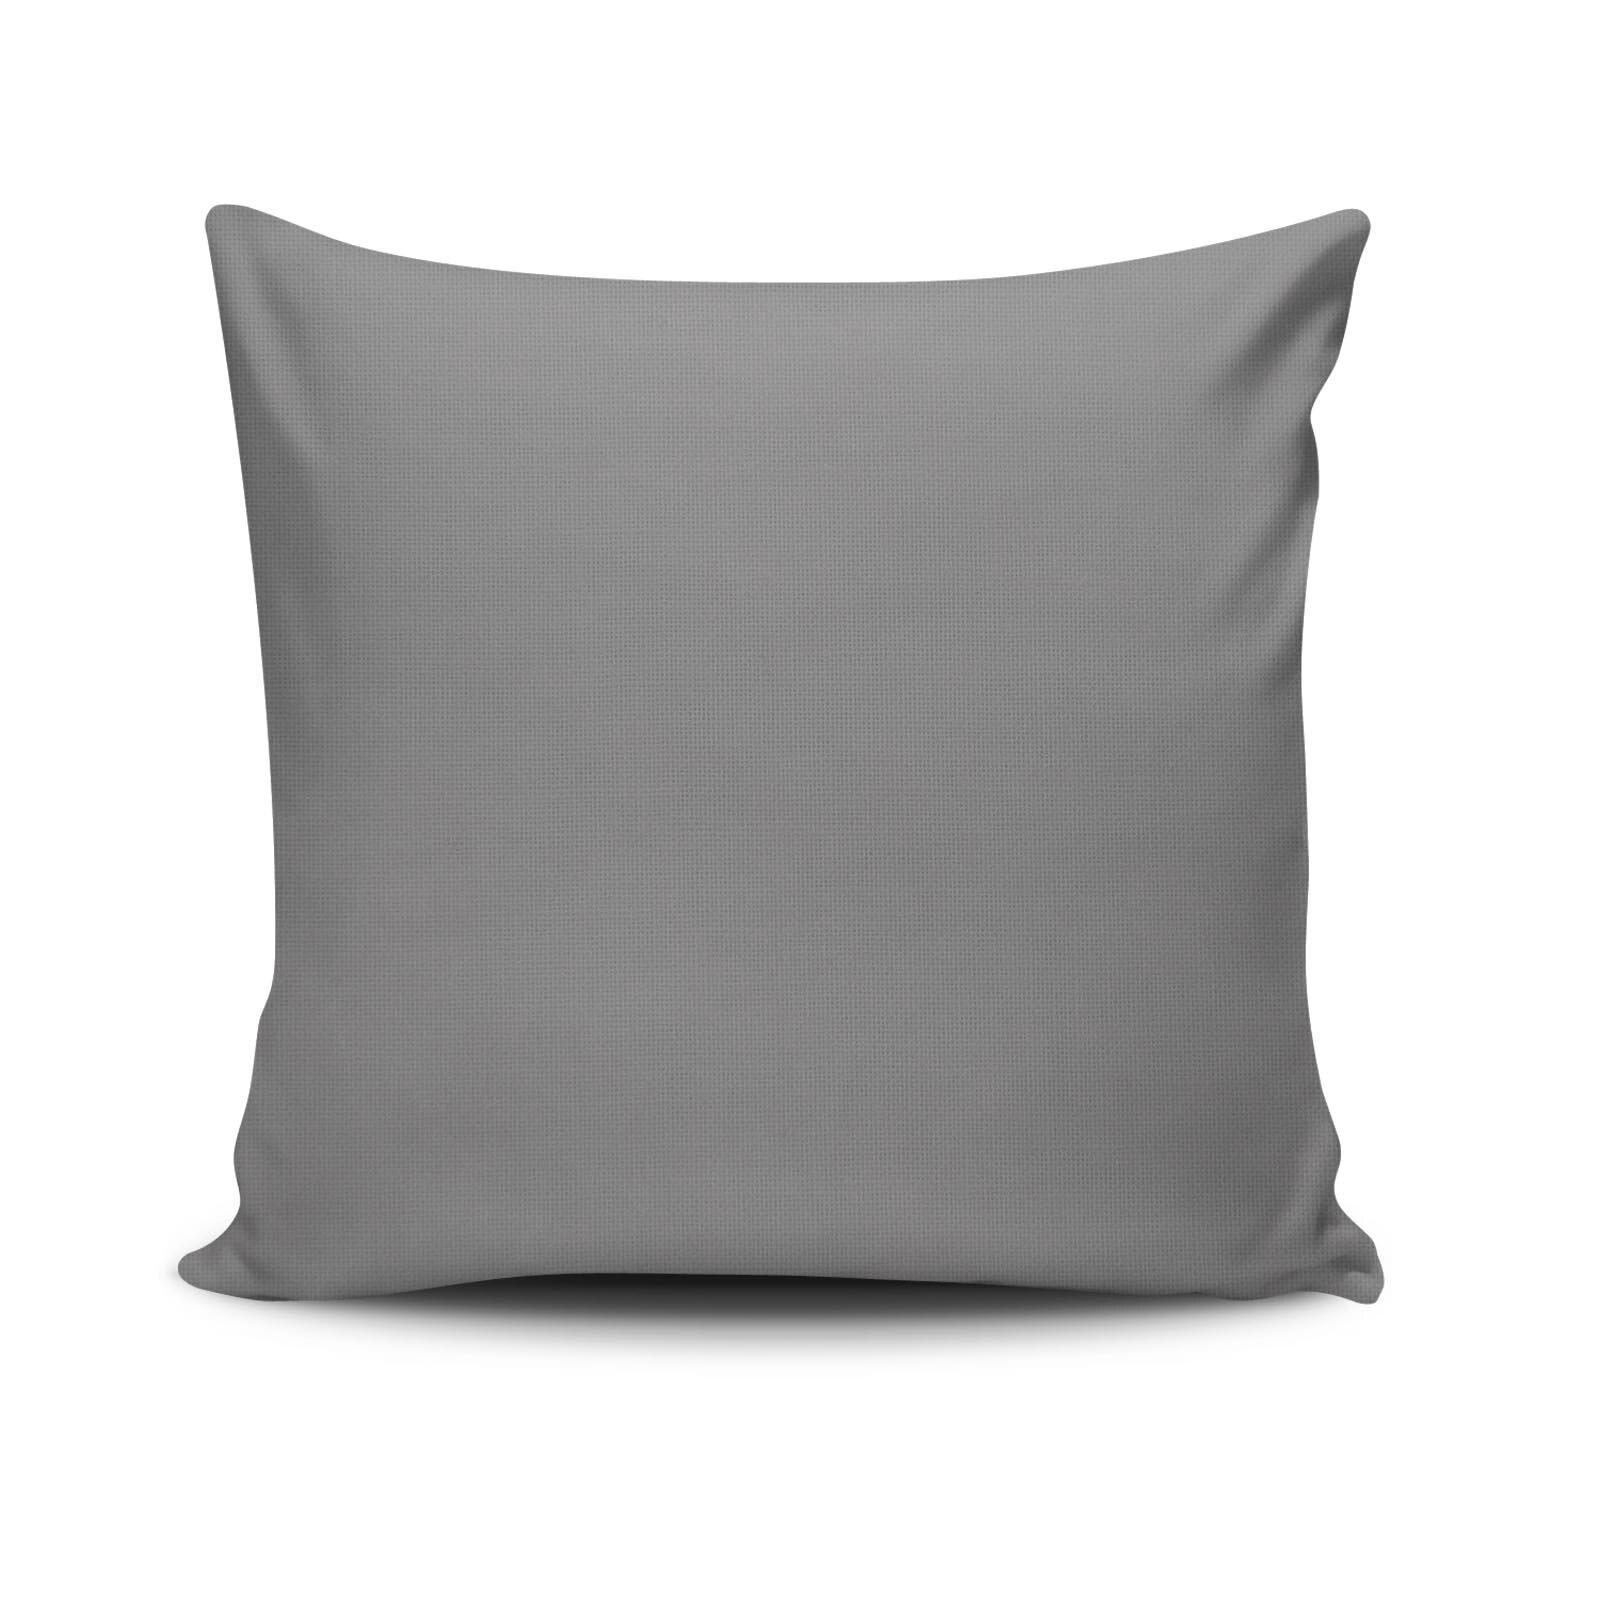 Perna decorativa Spiffy, Dimensiune: 45 x 45 cm, Material exterior: 50% bumbac / 50% poliester 425SPF0183